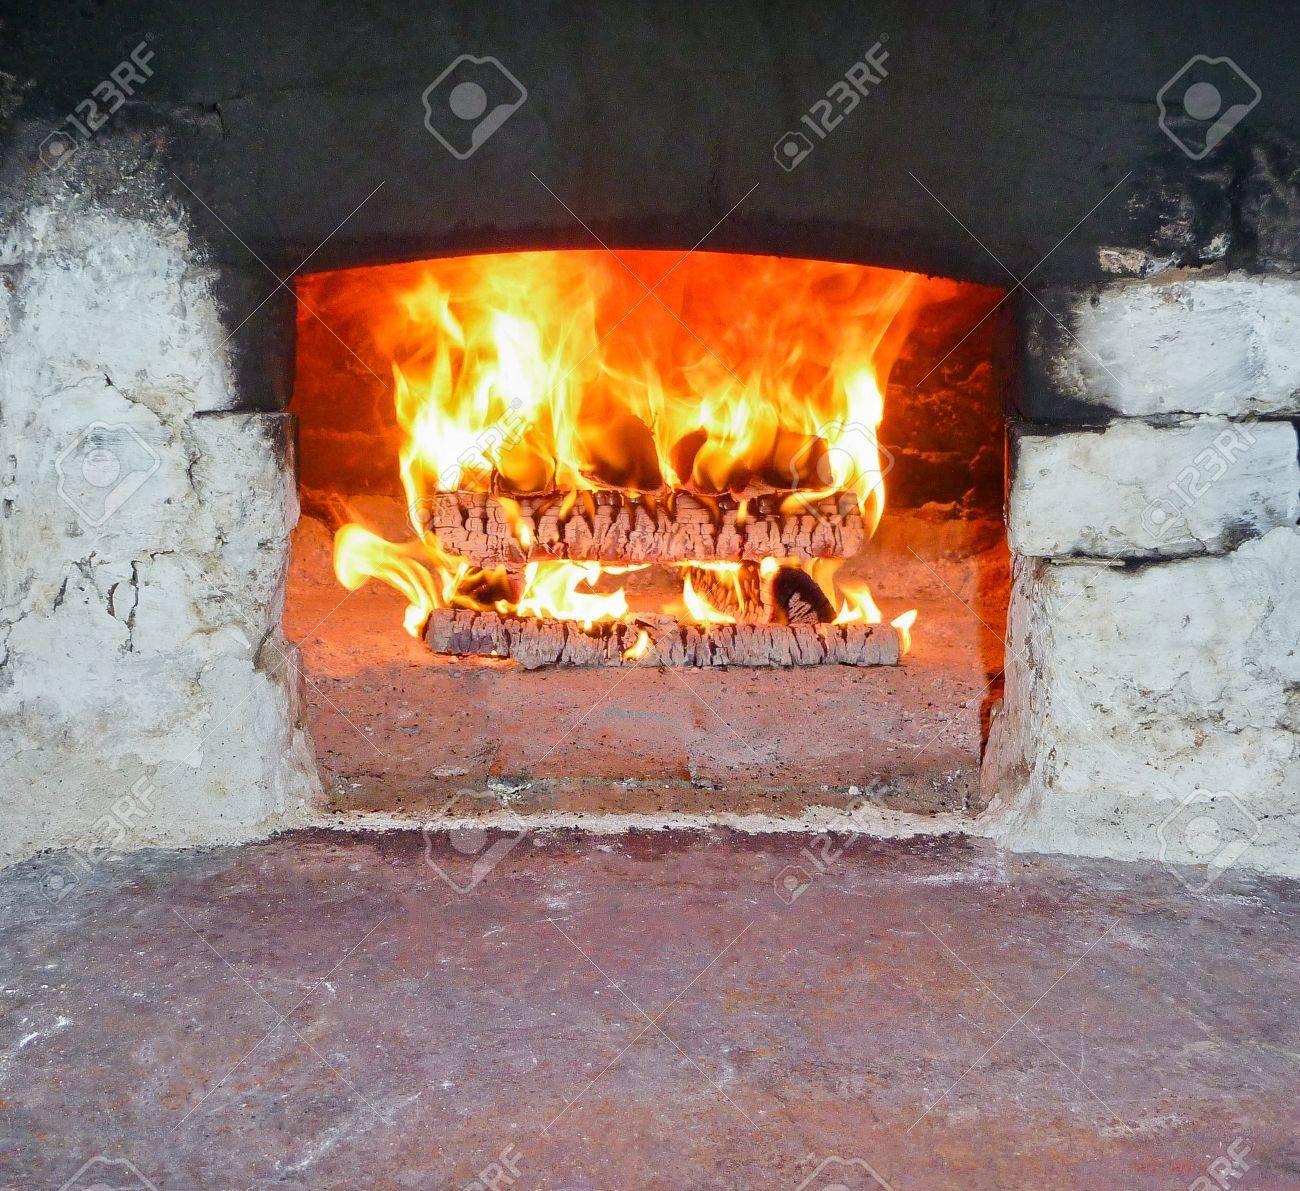 Burning Firewood in the brick Furnace Stock Photo - 13382260